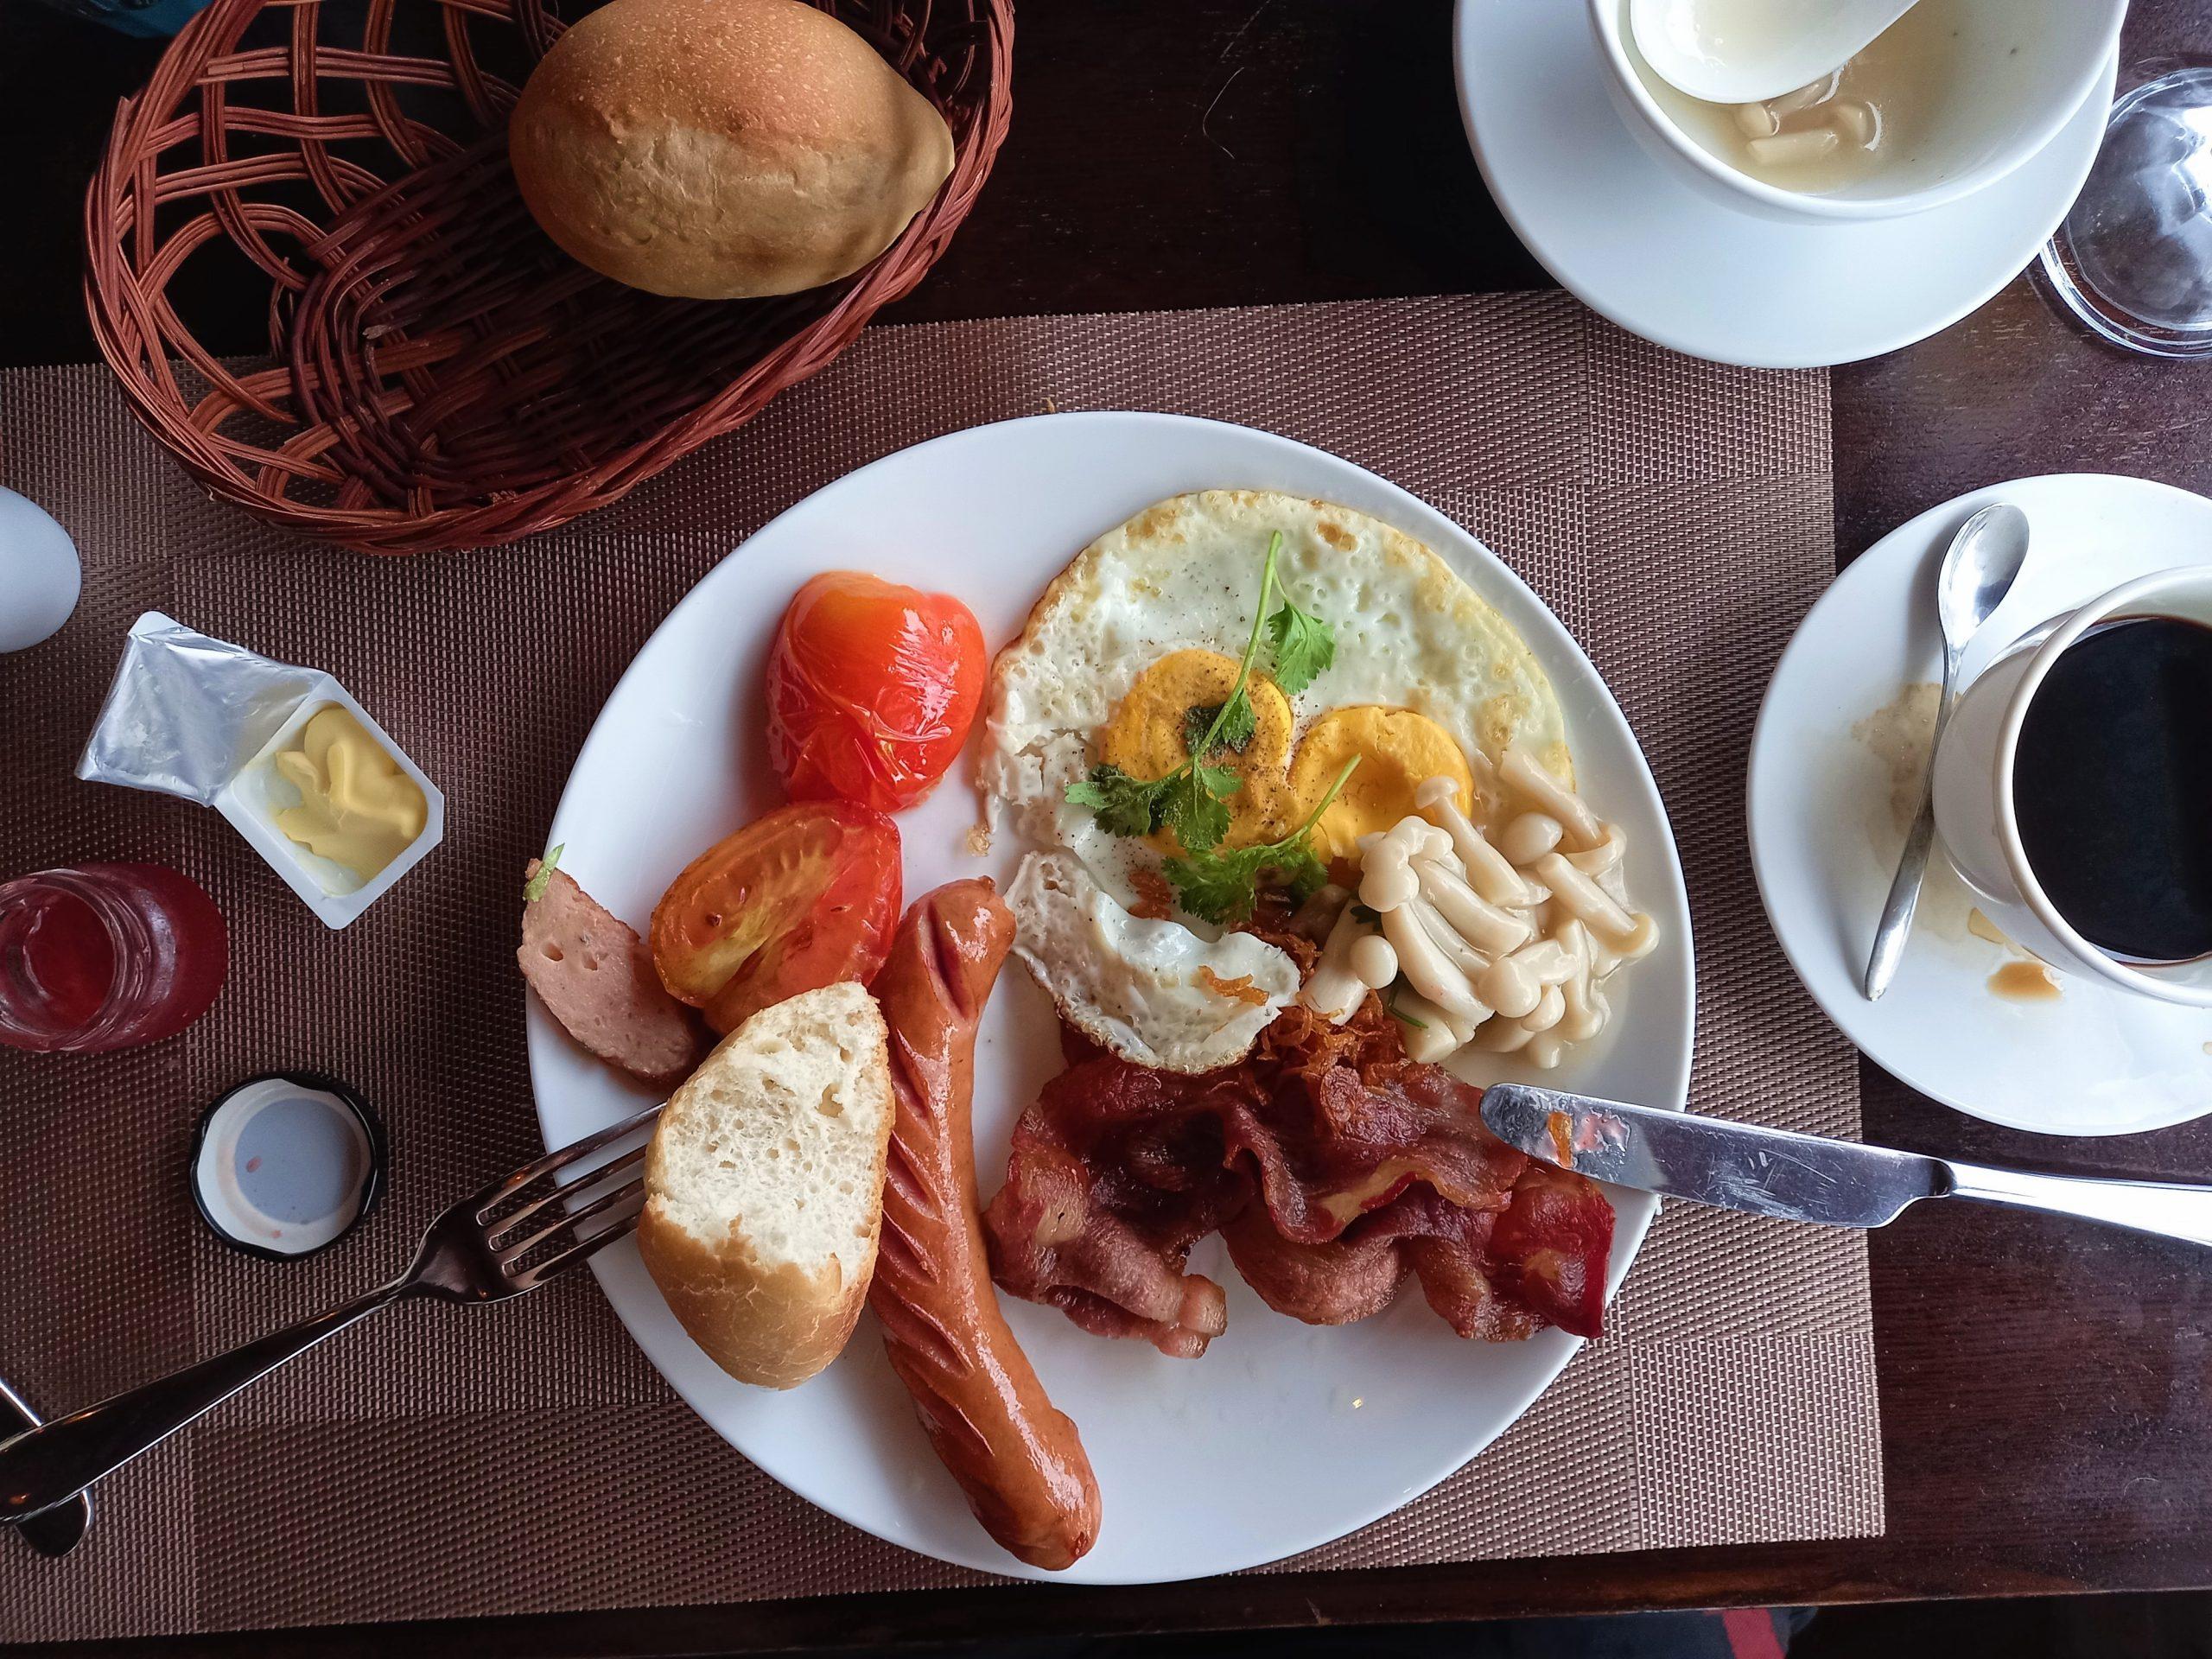 Breakfast at Gold Coast Resort, Phu Quoc Island, Vietnam